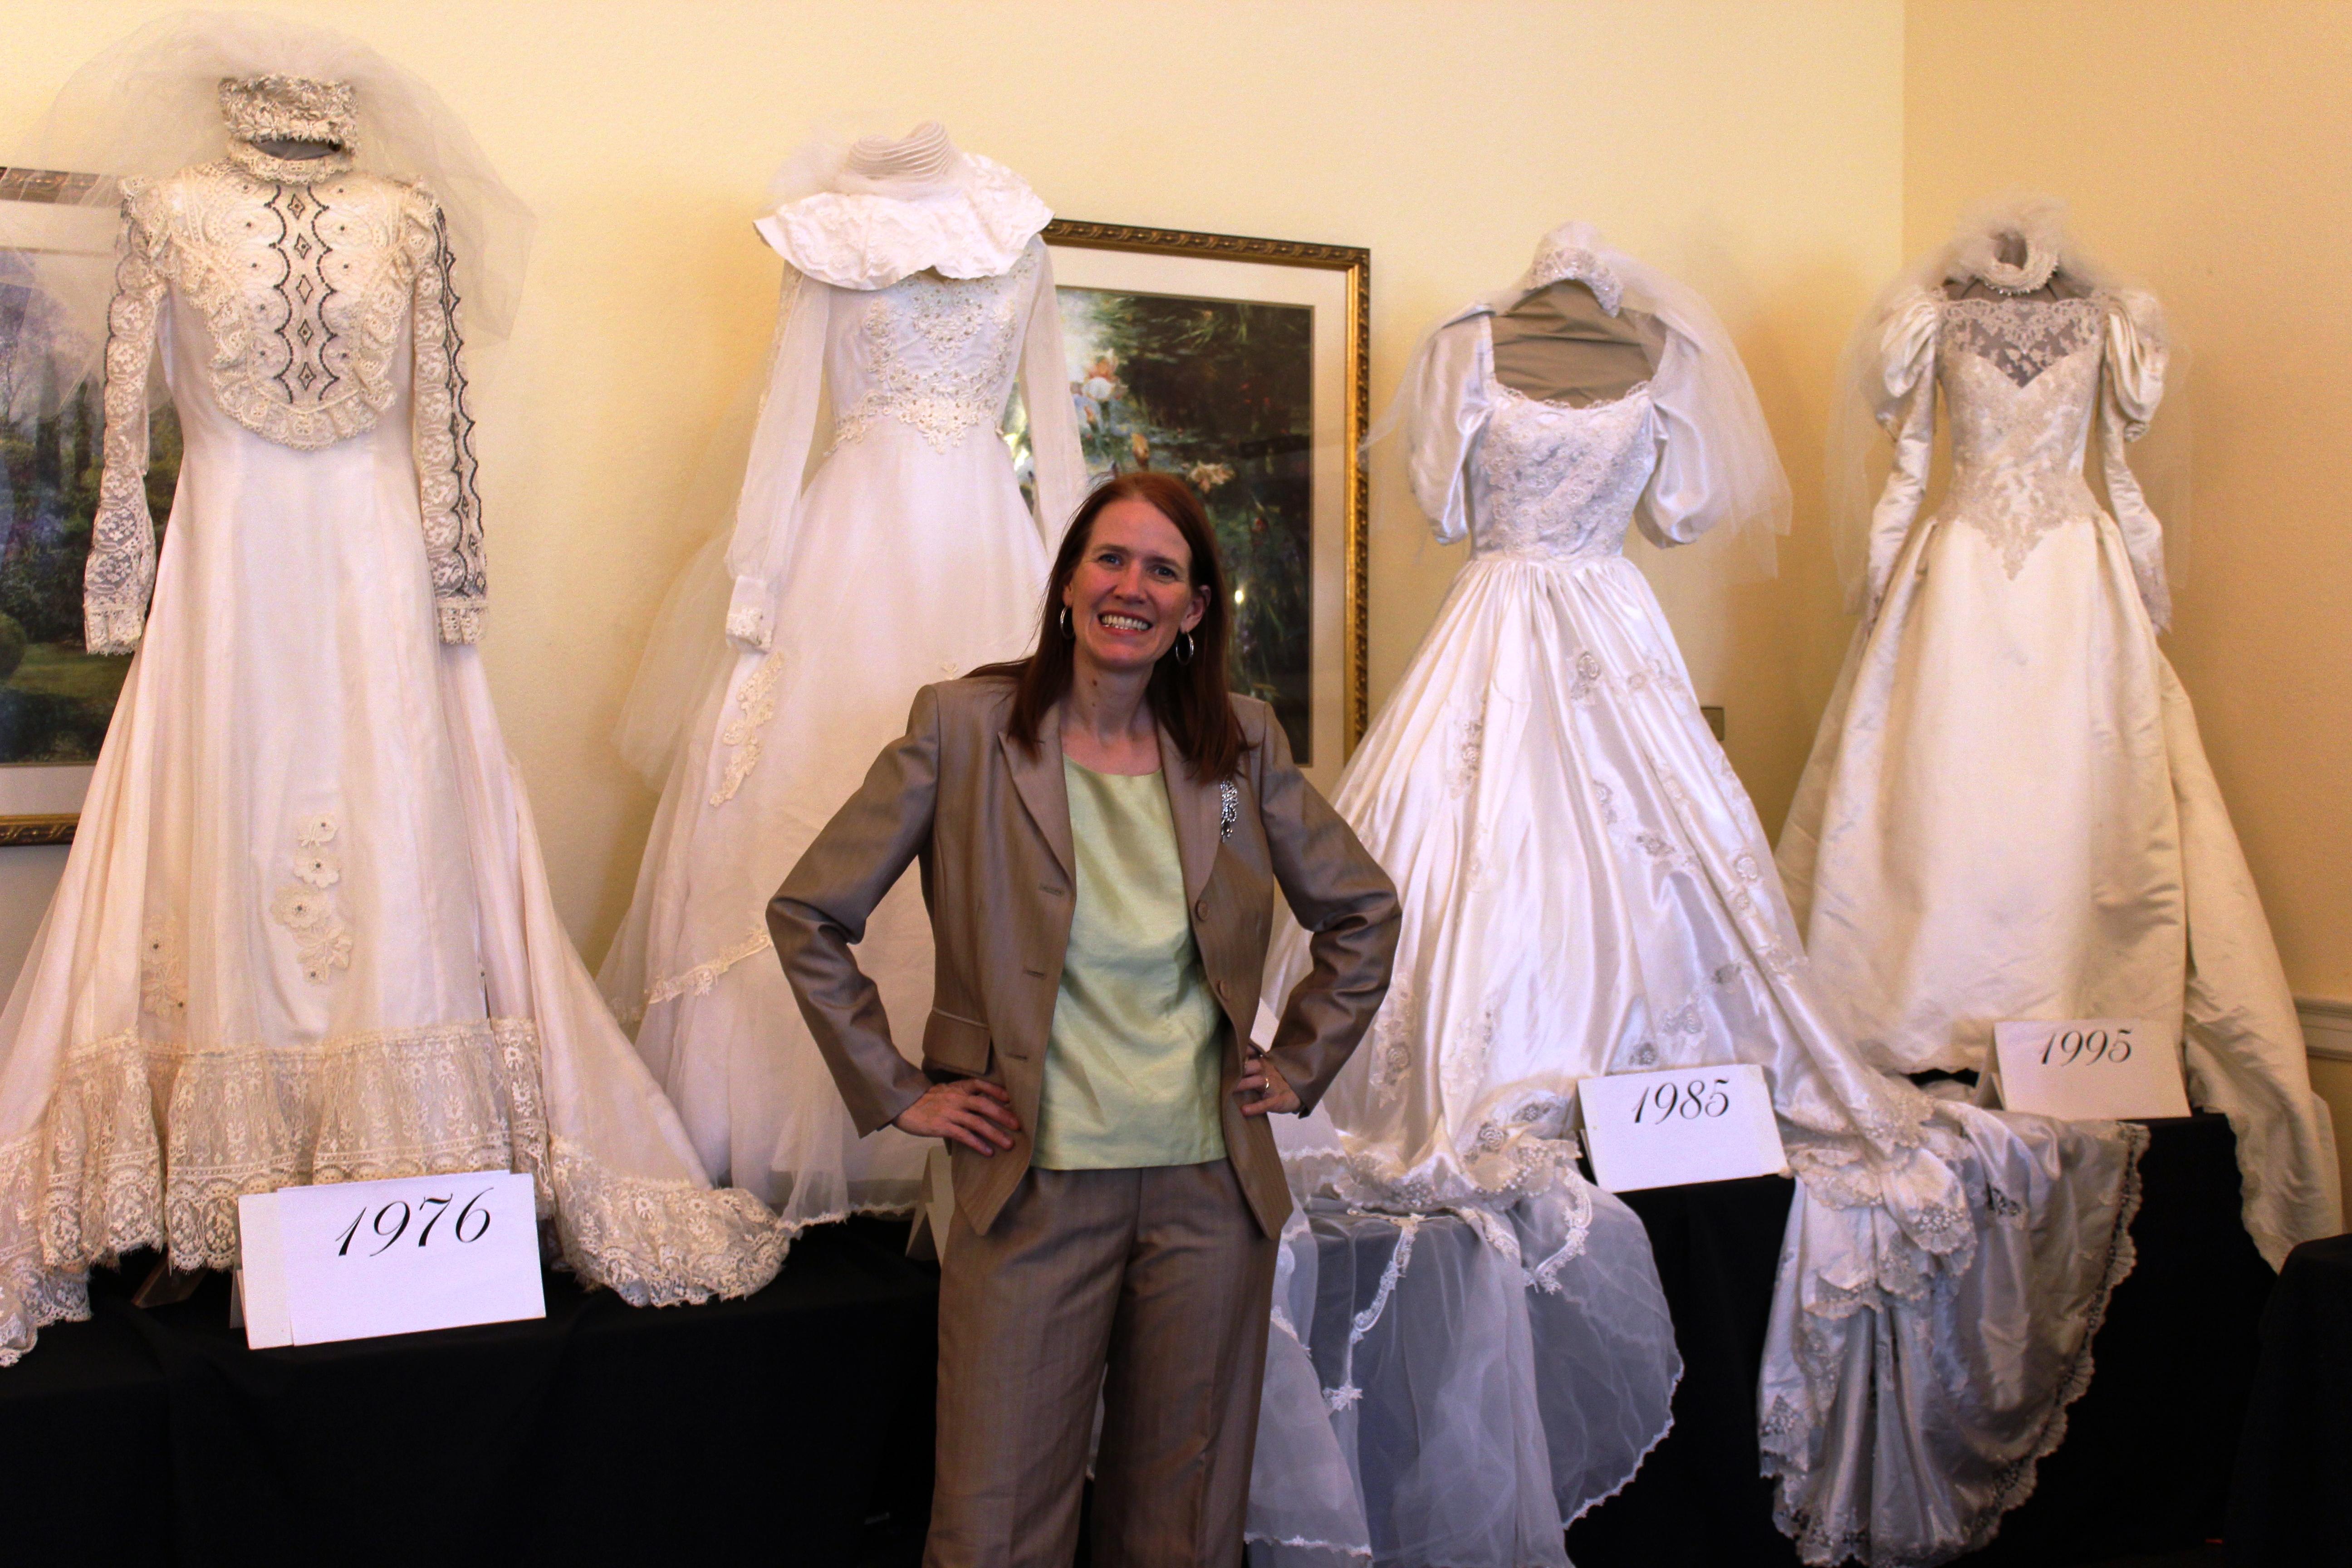 Vintage Wedding Dresses Florida: Blog-Bridges Retirement Communities In Brandon Fl